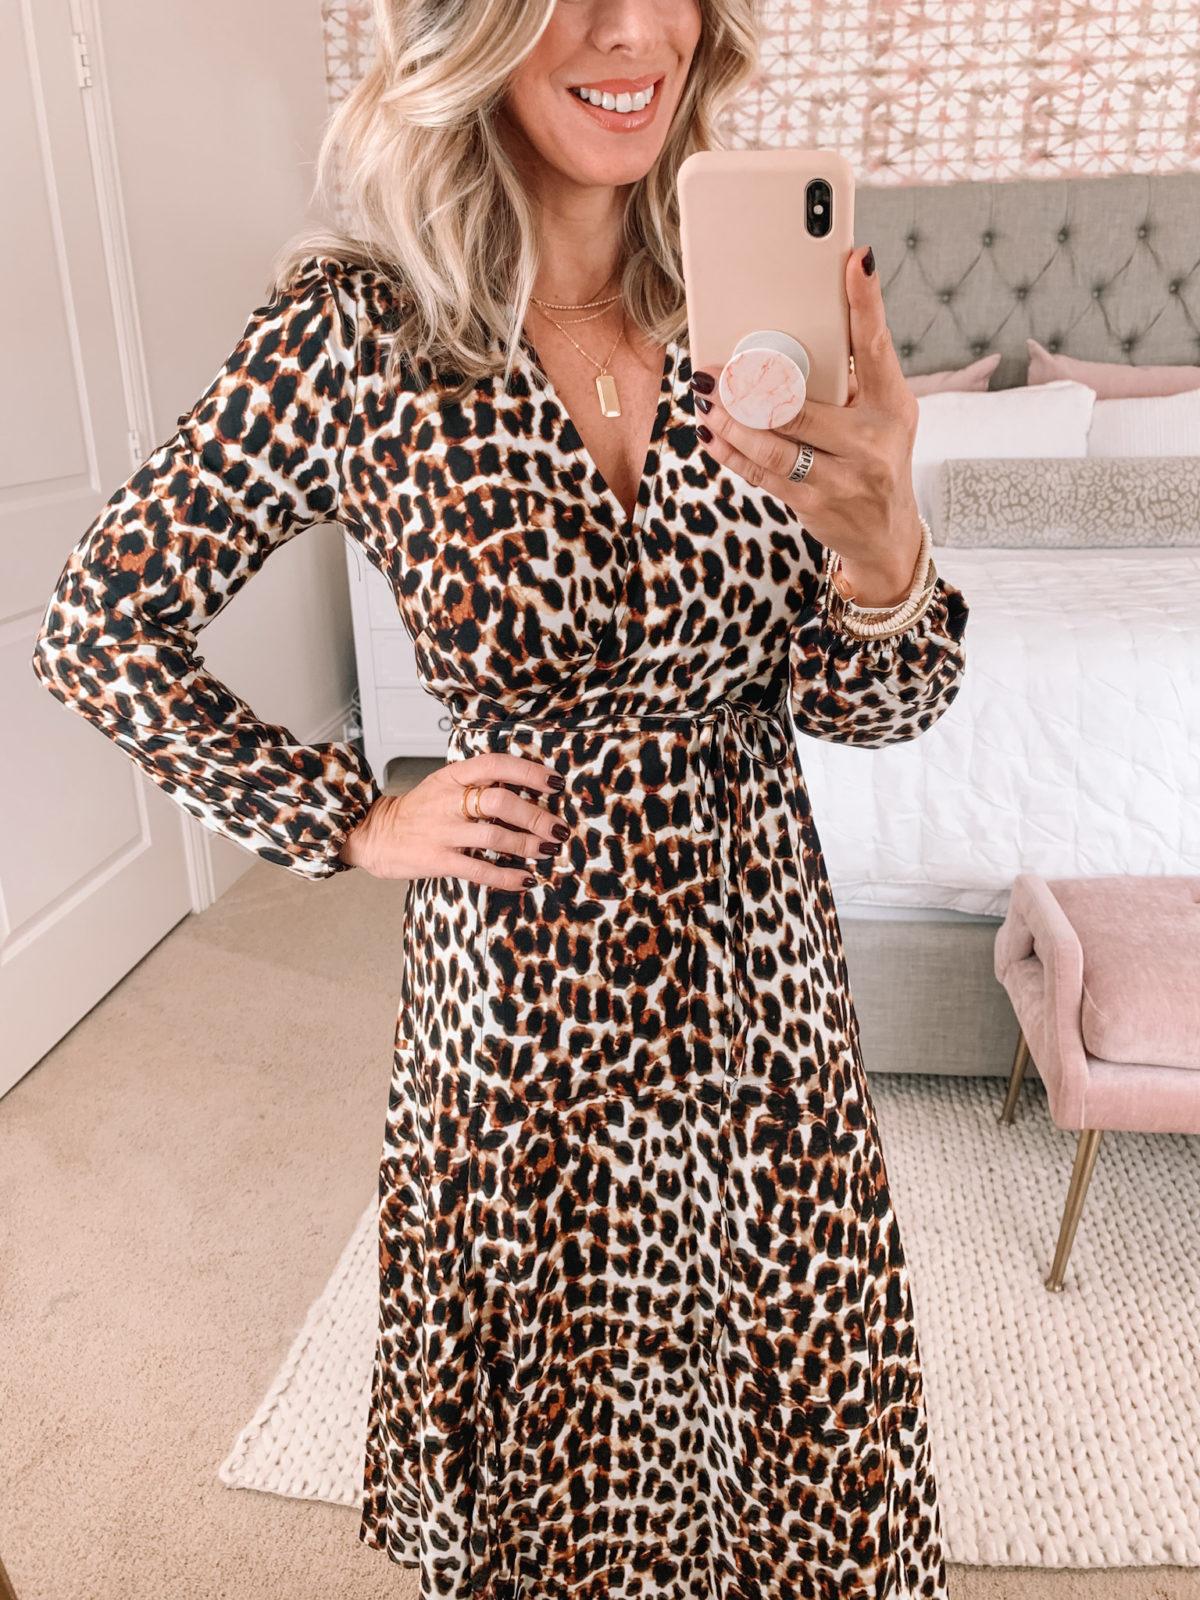 Walmart Fashion, Leopard Dress, Clear Heels